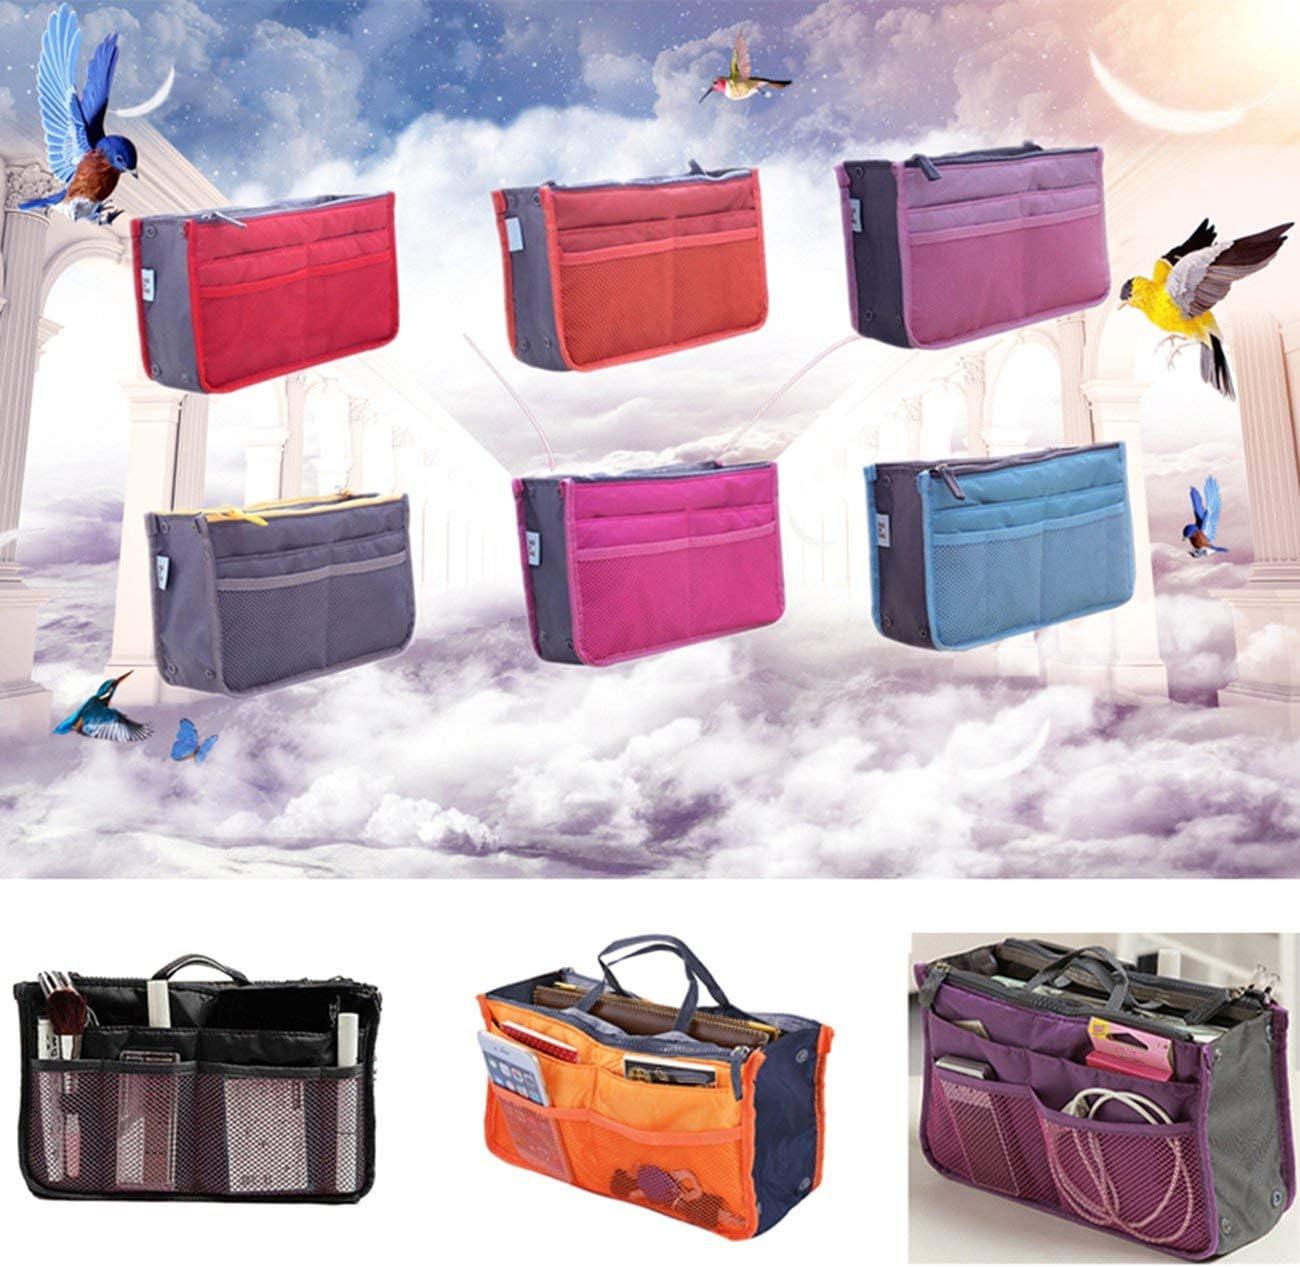 FYstar Female Tote Organizer Insert Bag Women Travel Insert Organizer Handbag